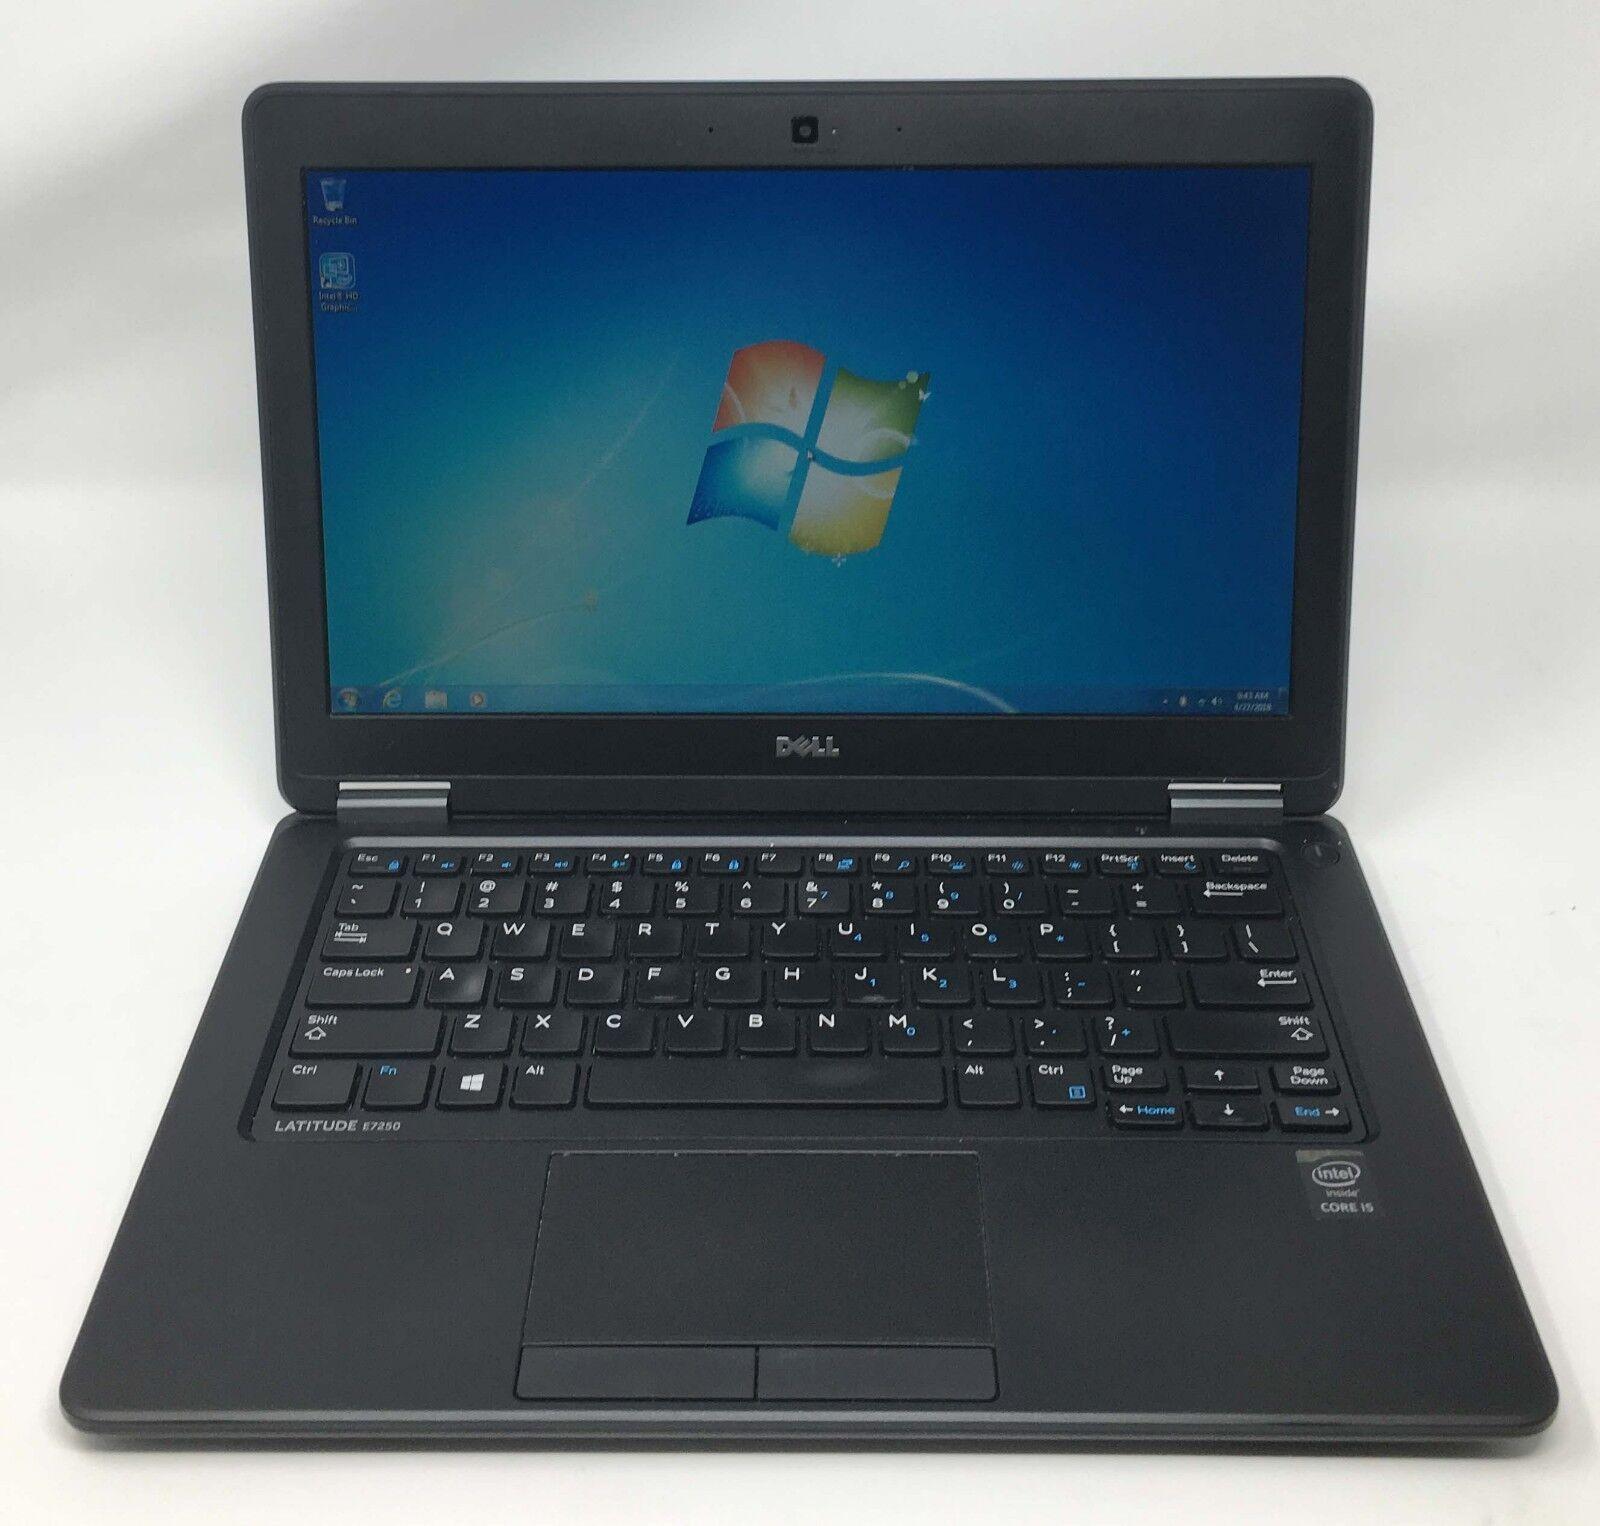 Dell Ultrabook E7250 Core i5-5300u 2.3GHz 8GB 128GB SSD Webcam Win 7 Laptop